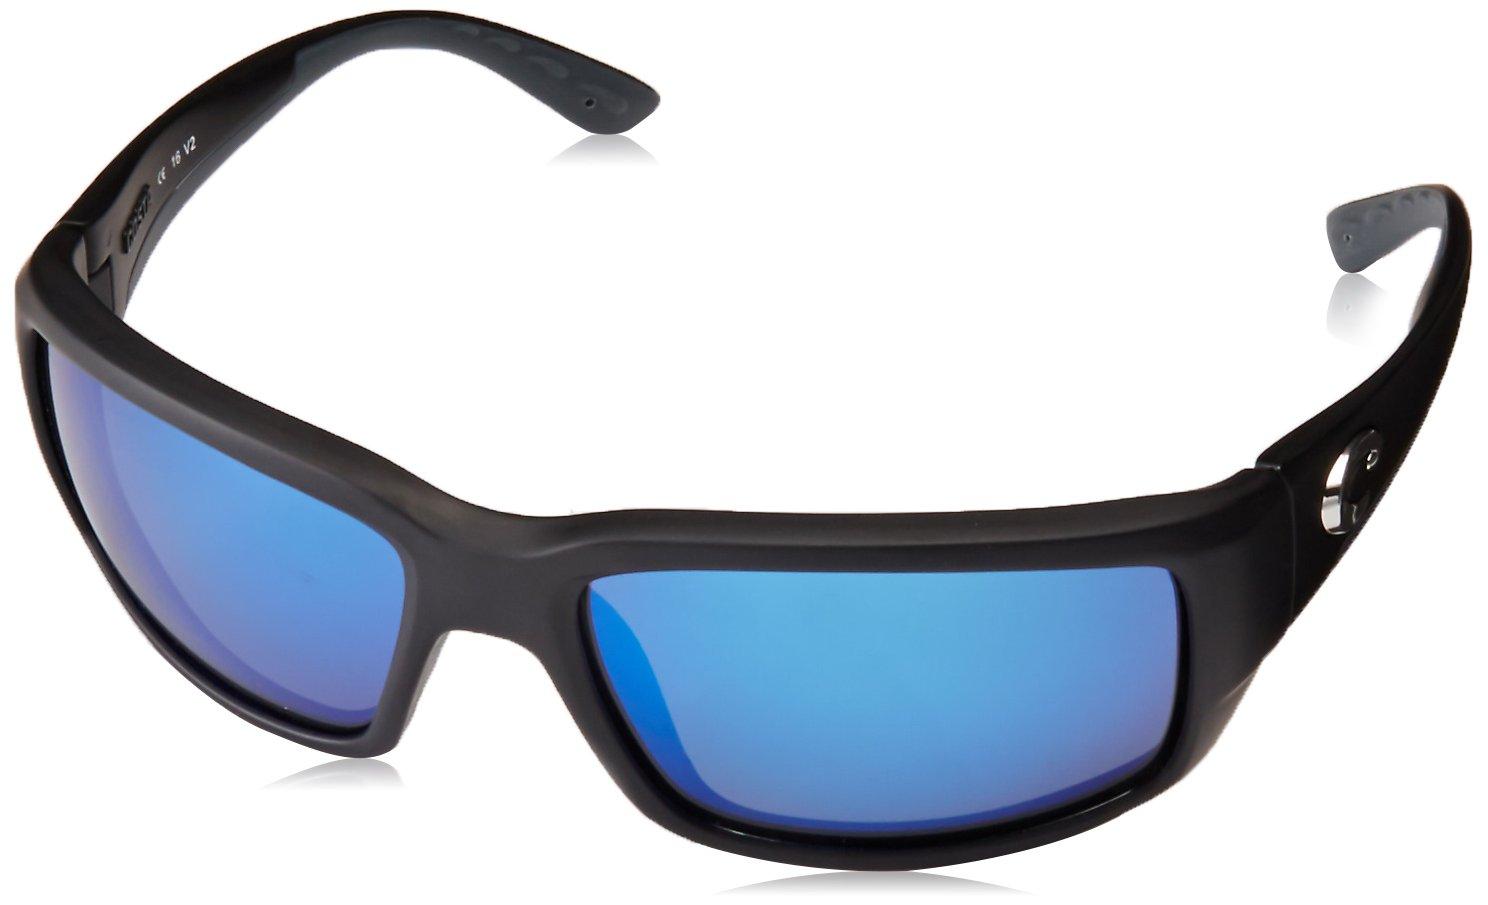 Costa del Mar Unisex-Adult Fantail TF 11 OBMGLP Polarized Iridium Rectangular Sunglasses, Black, 59.3 mm